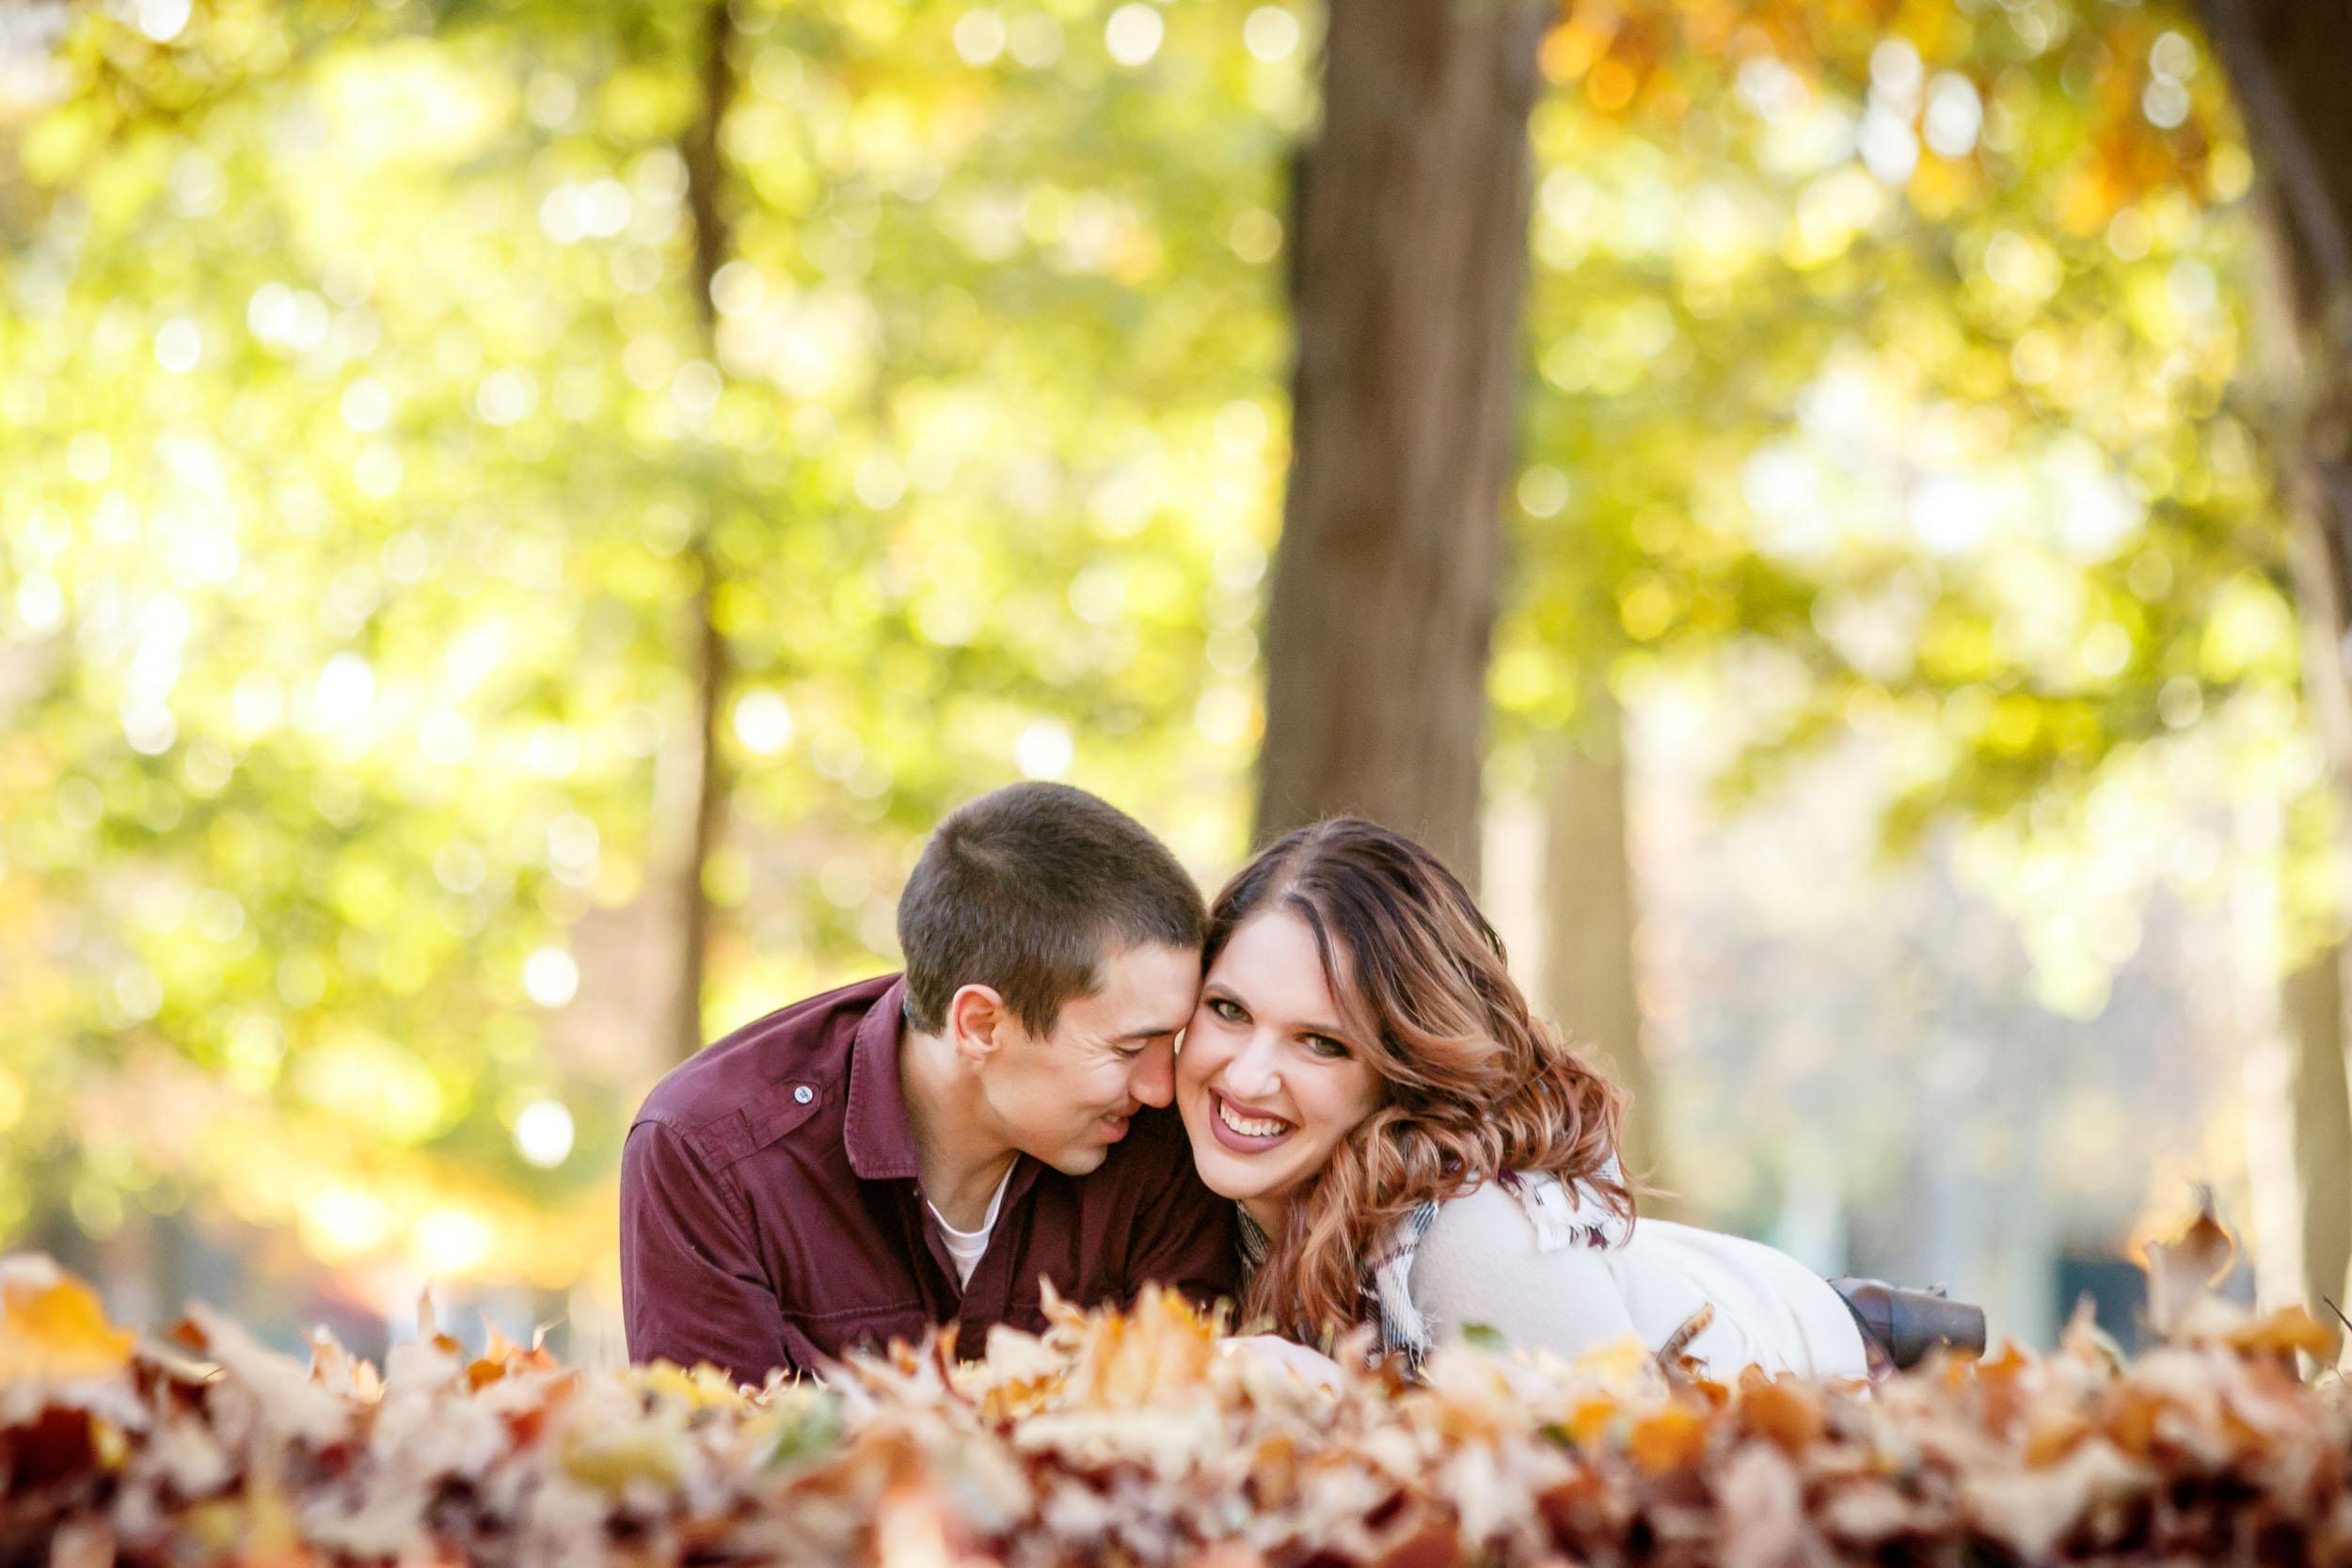 fall-engagement-photos-riverside-park-neenah-wisconsin--adam-shea-photography-green-bay-appleton-neenah-photographer-23.jpg